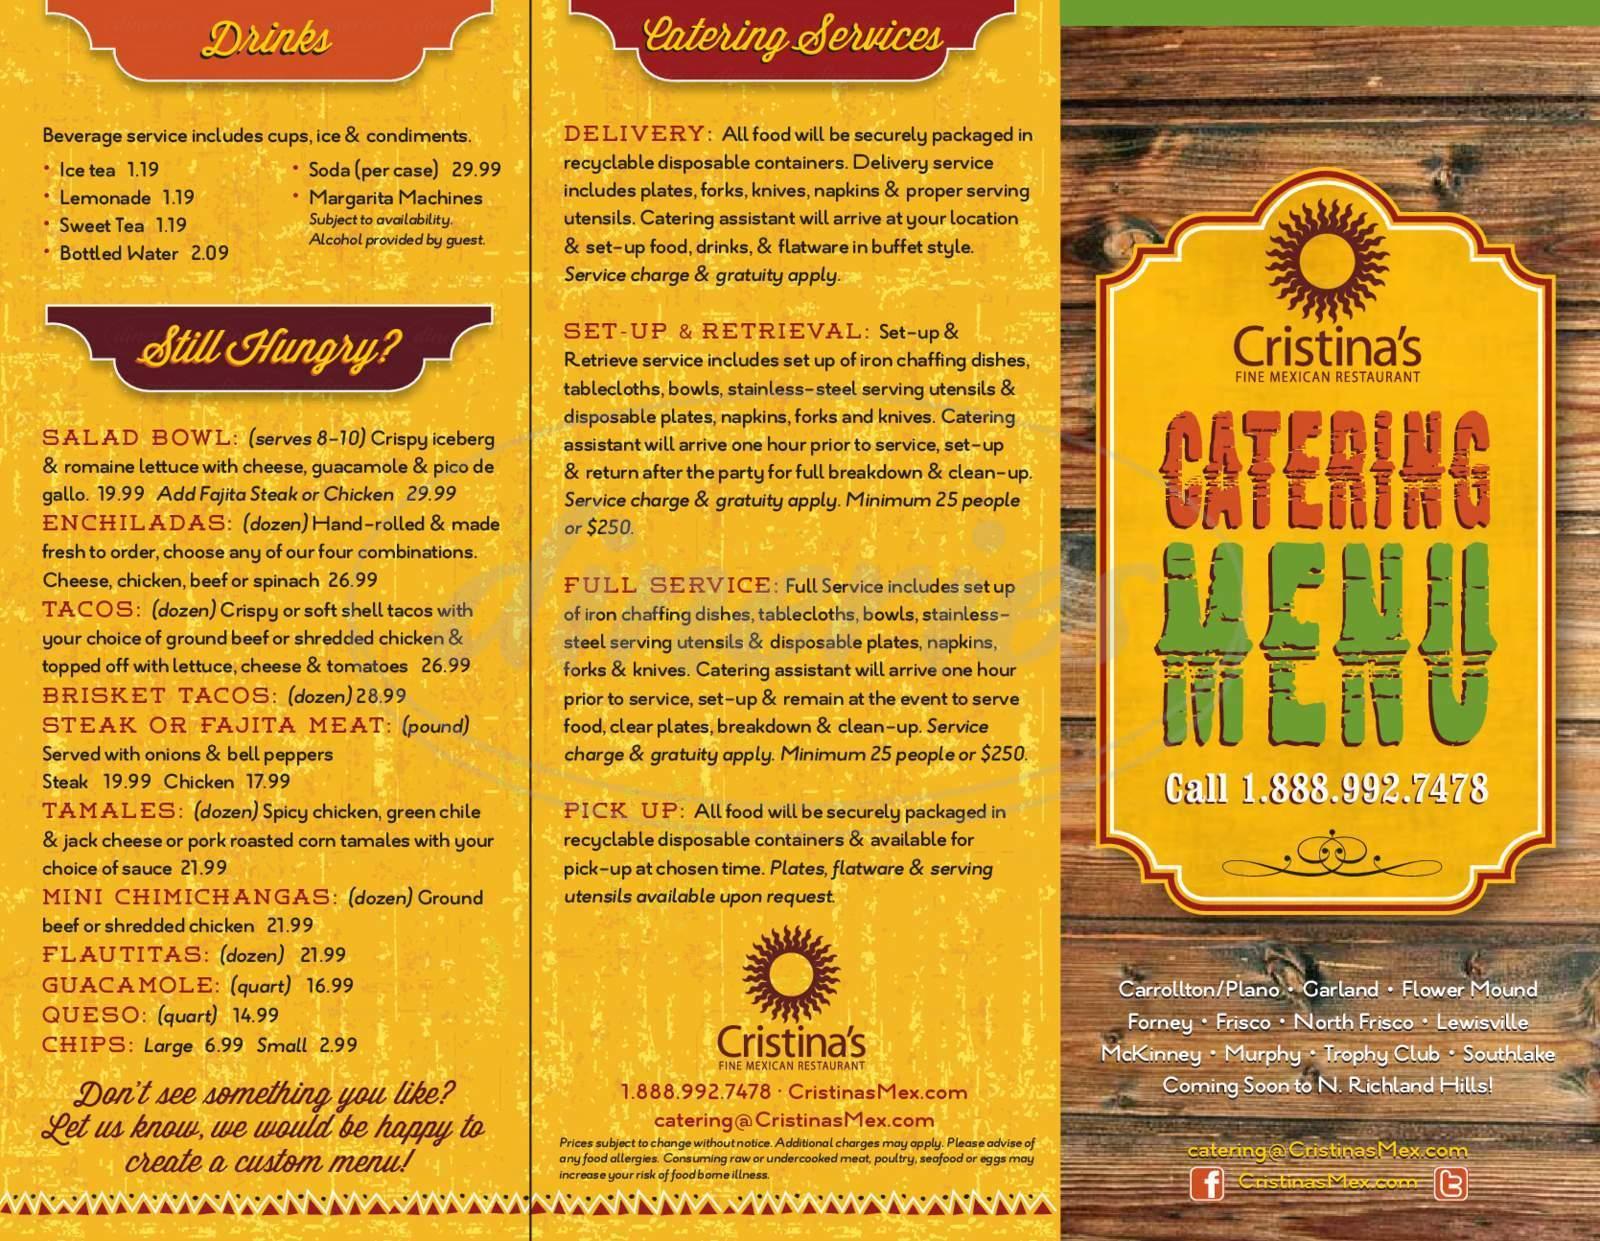 menu for Cristina's Fine Mexican Restaurant